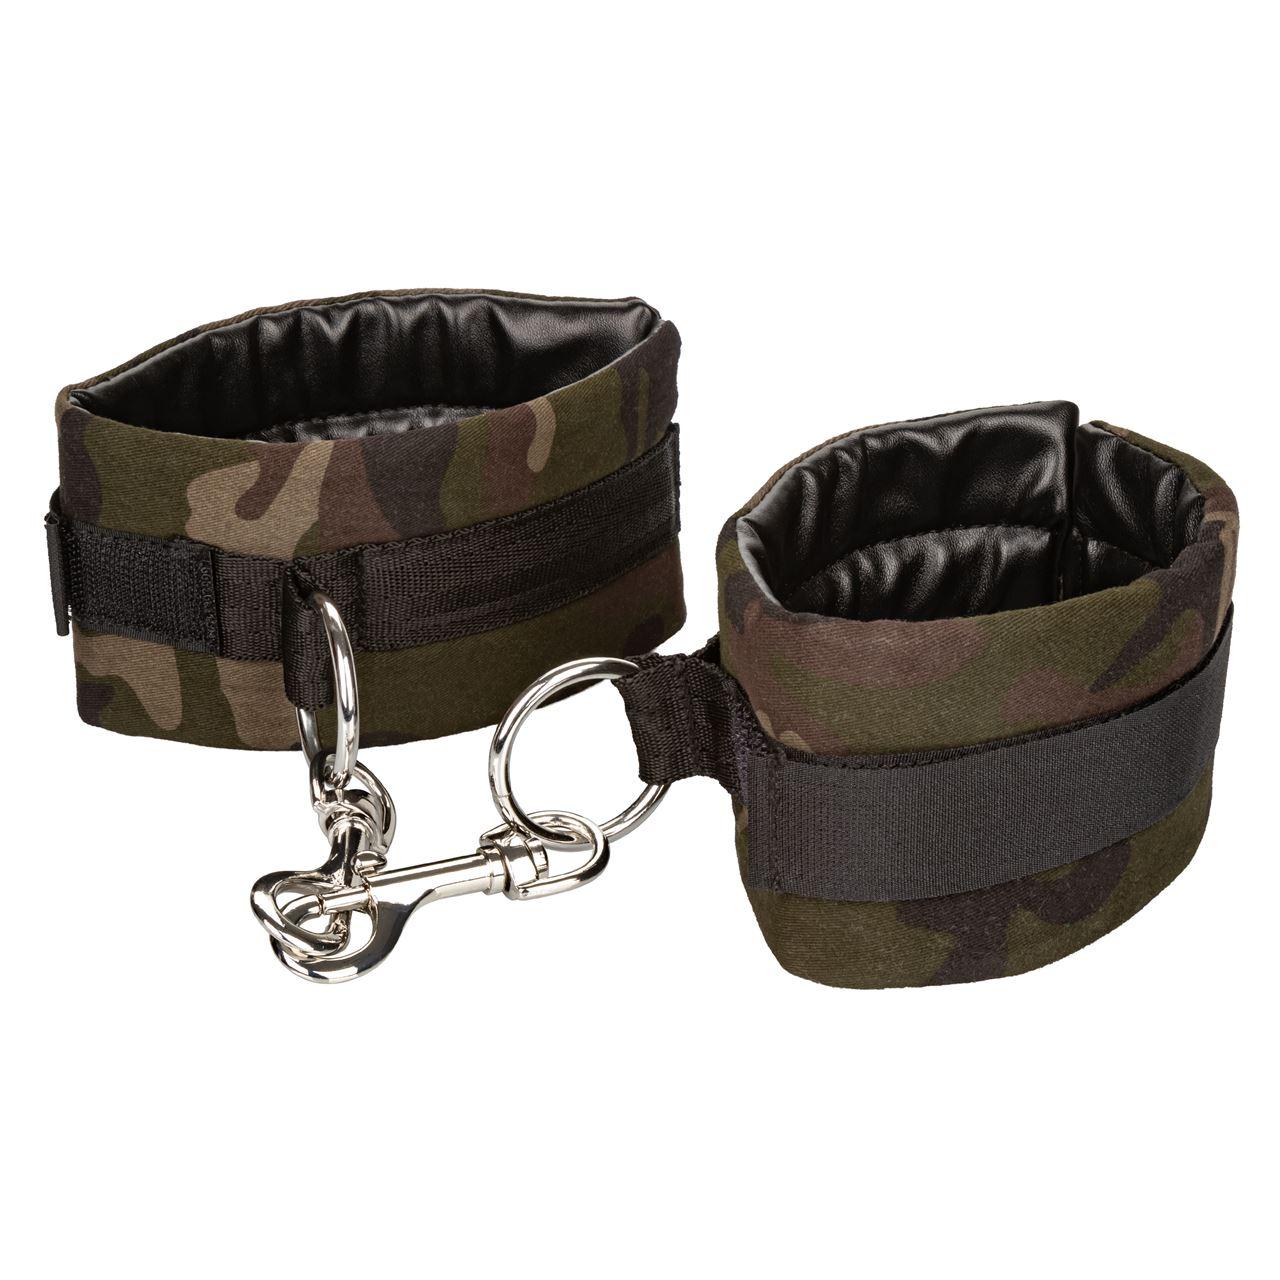 0019965_colt-camo-universal-cuffs_ymdvd5ntyflyxw5a.jpeg